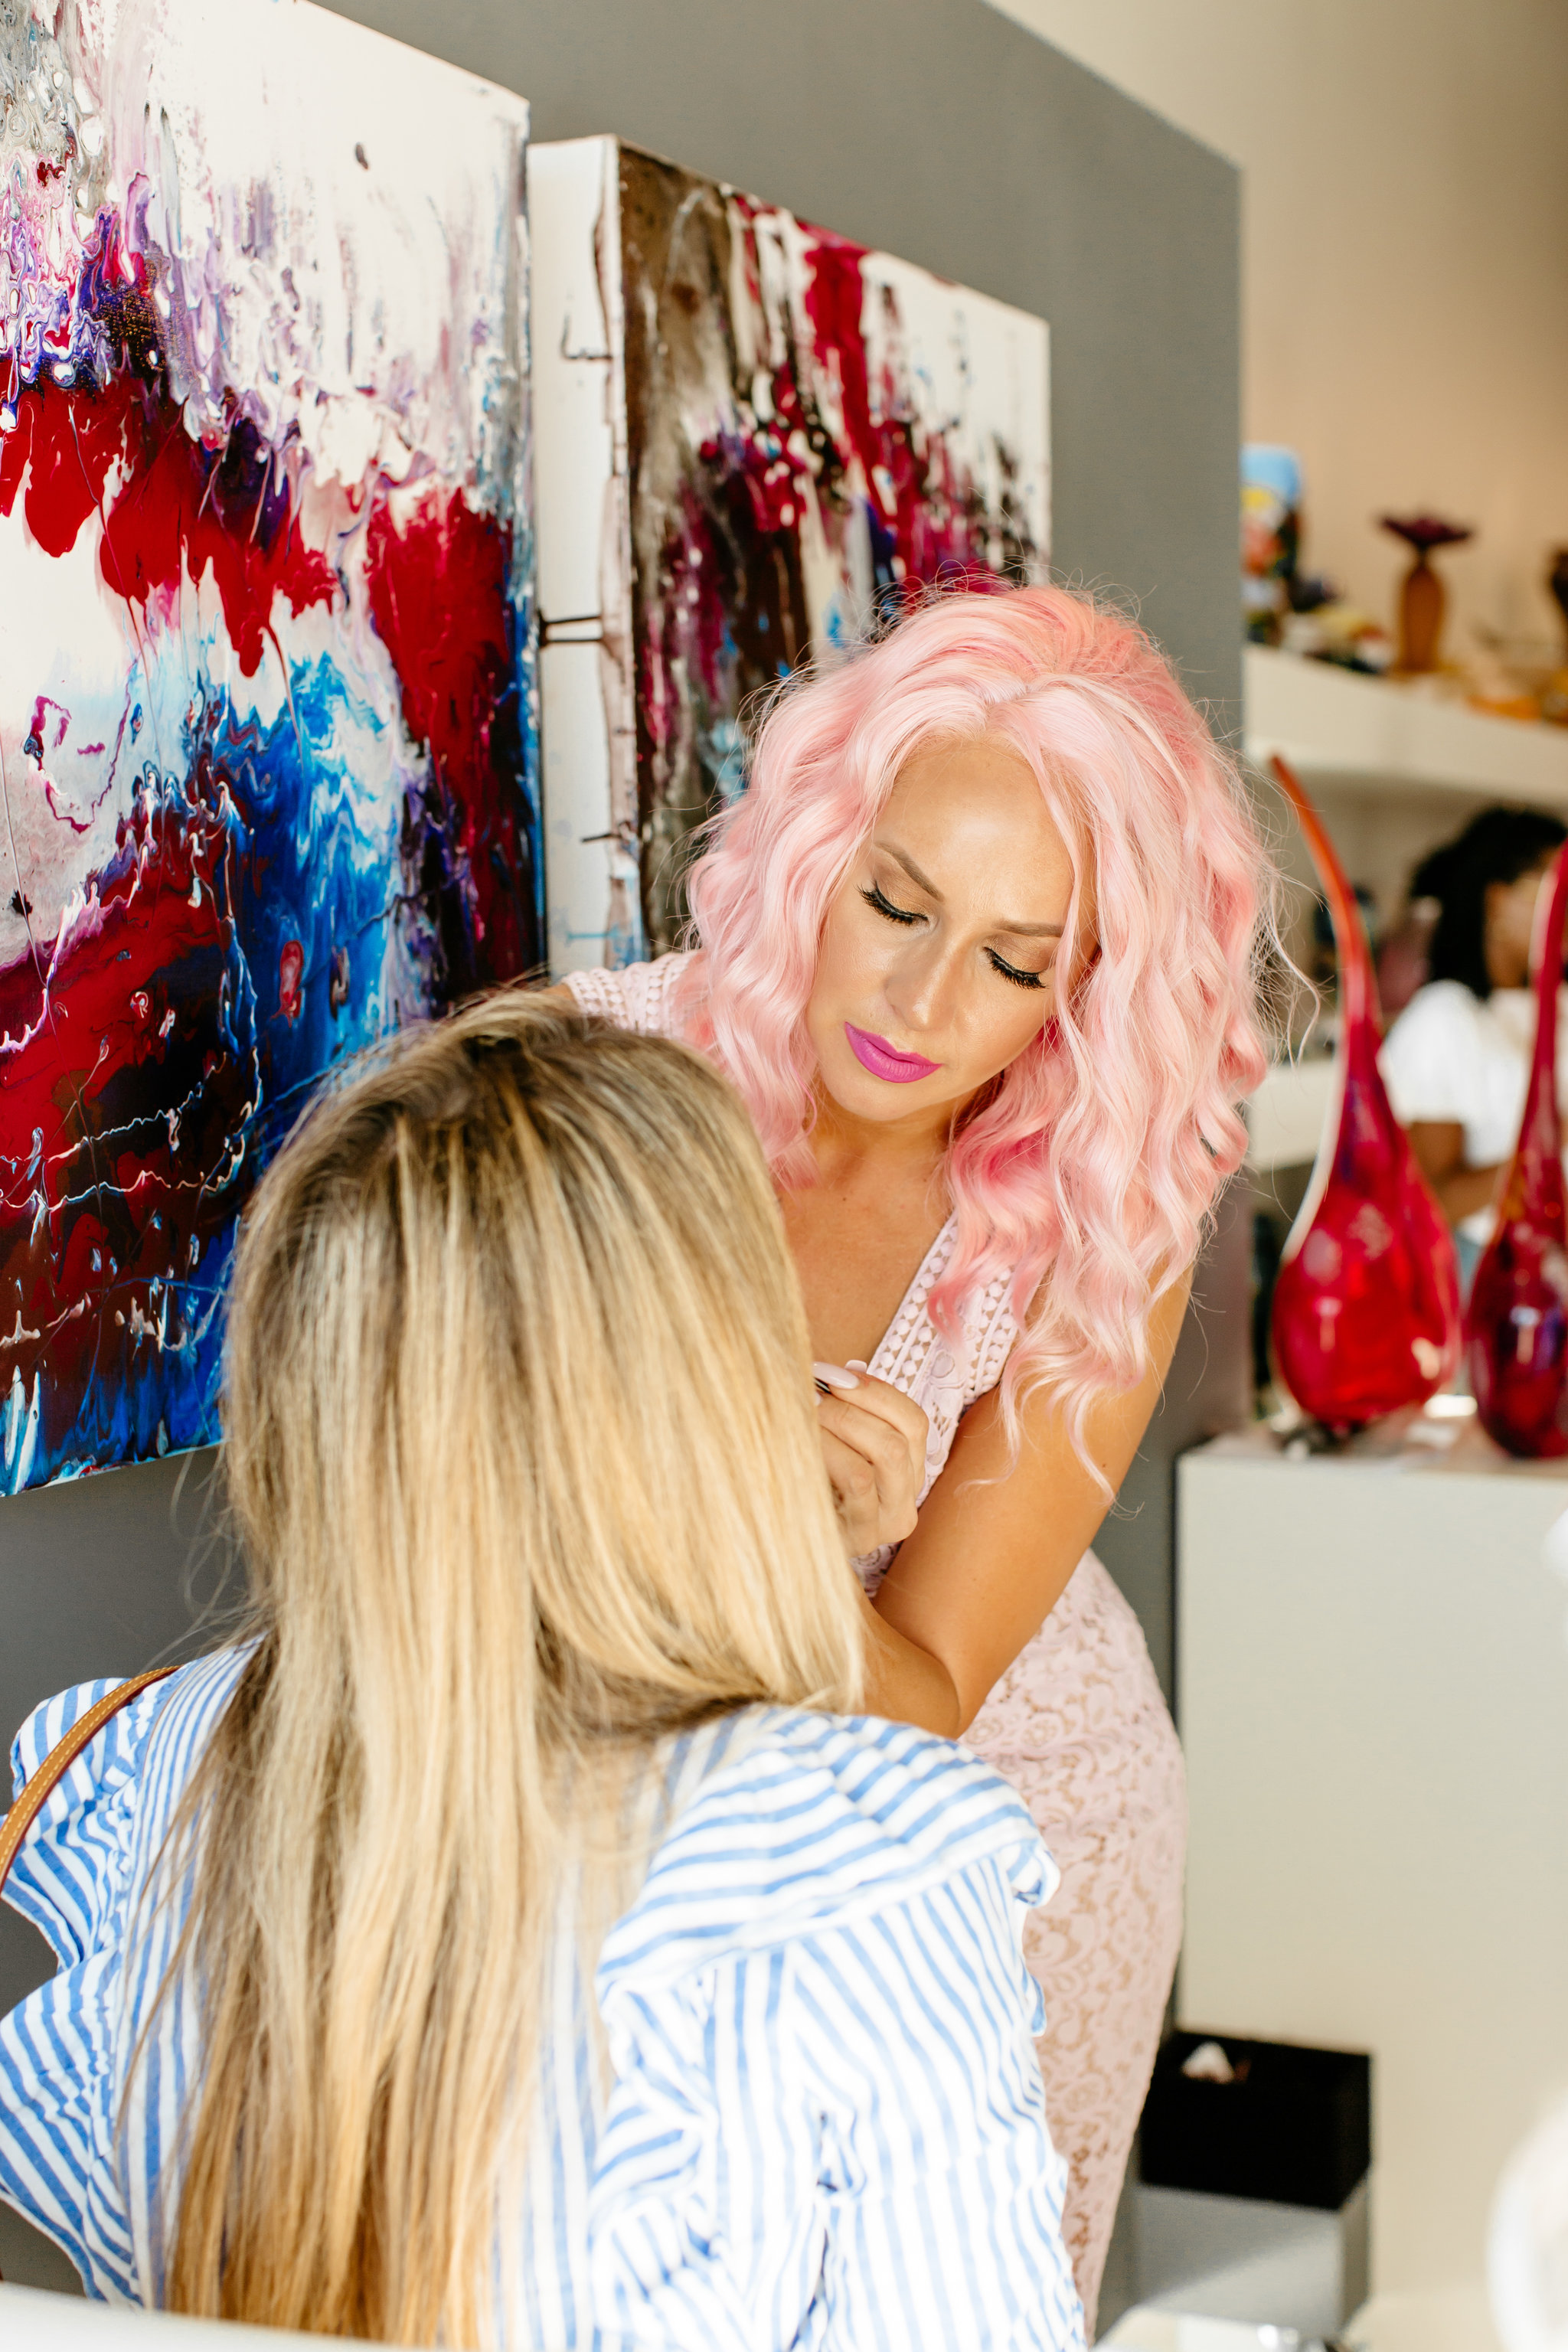 Alexa-Vossler-Photo_Dallas-Event-Photographer_Brite-Bar-Beauty-2018-Lipstick-Launch-Party-79.jpg